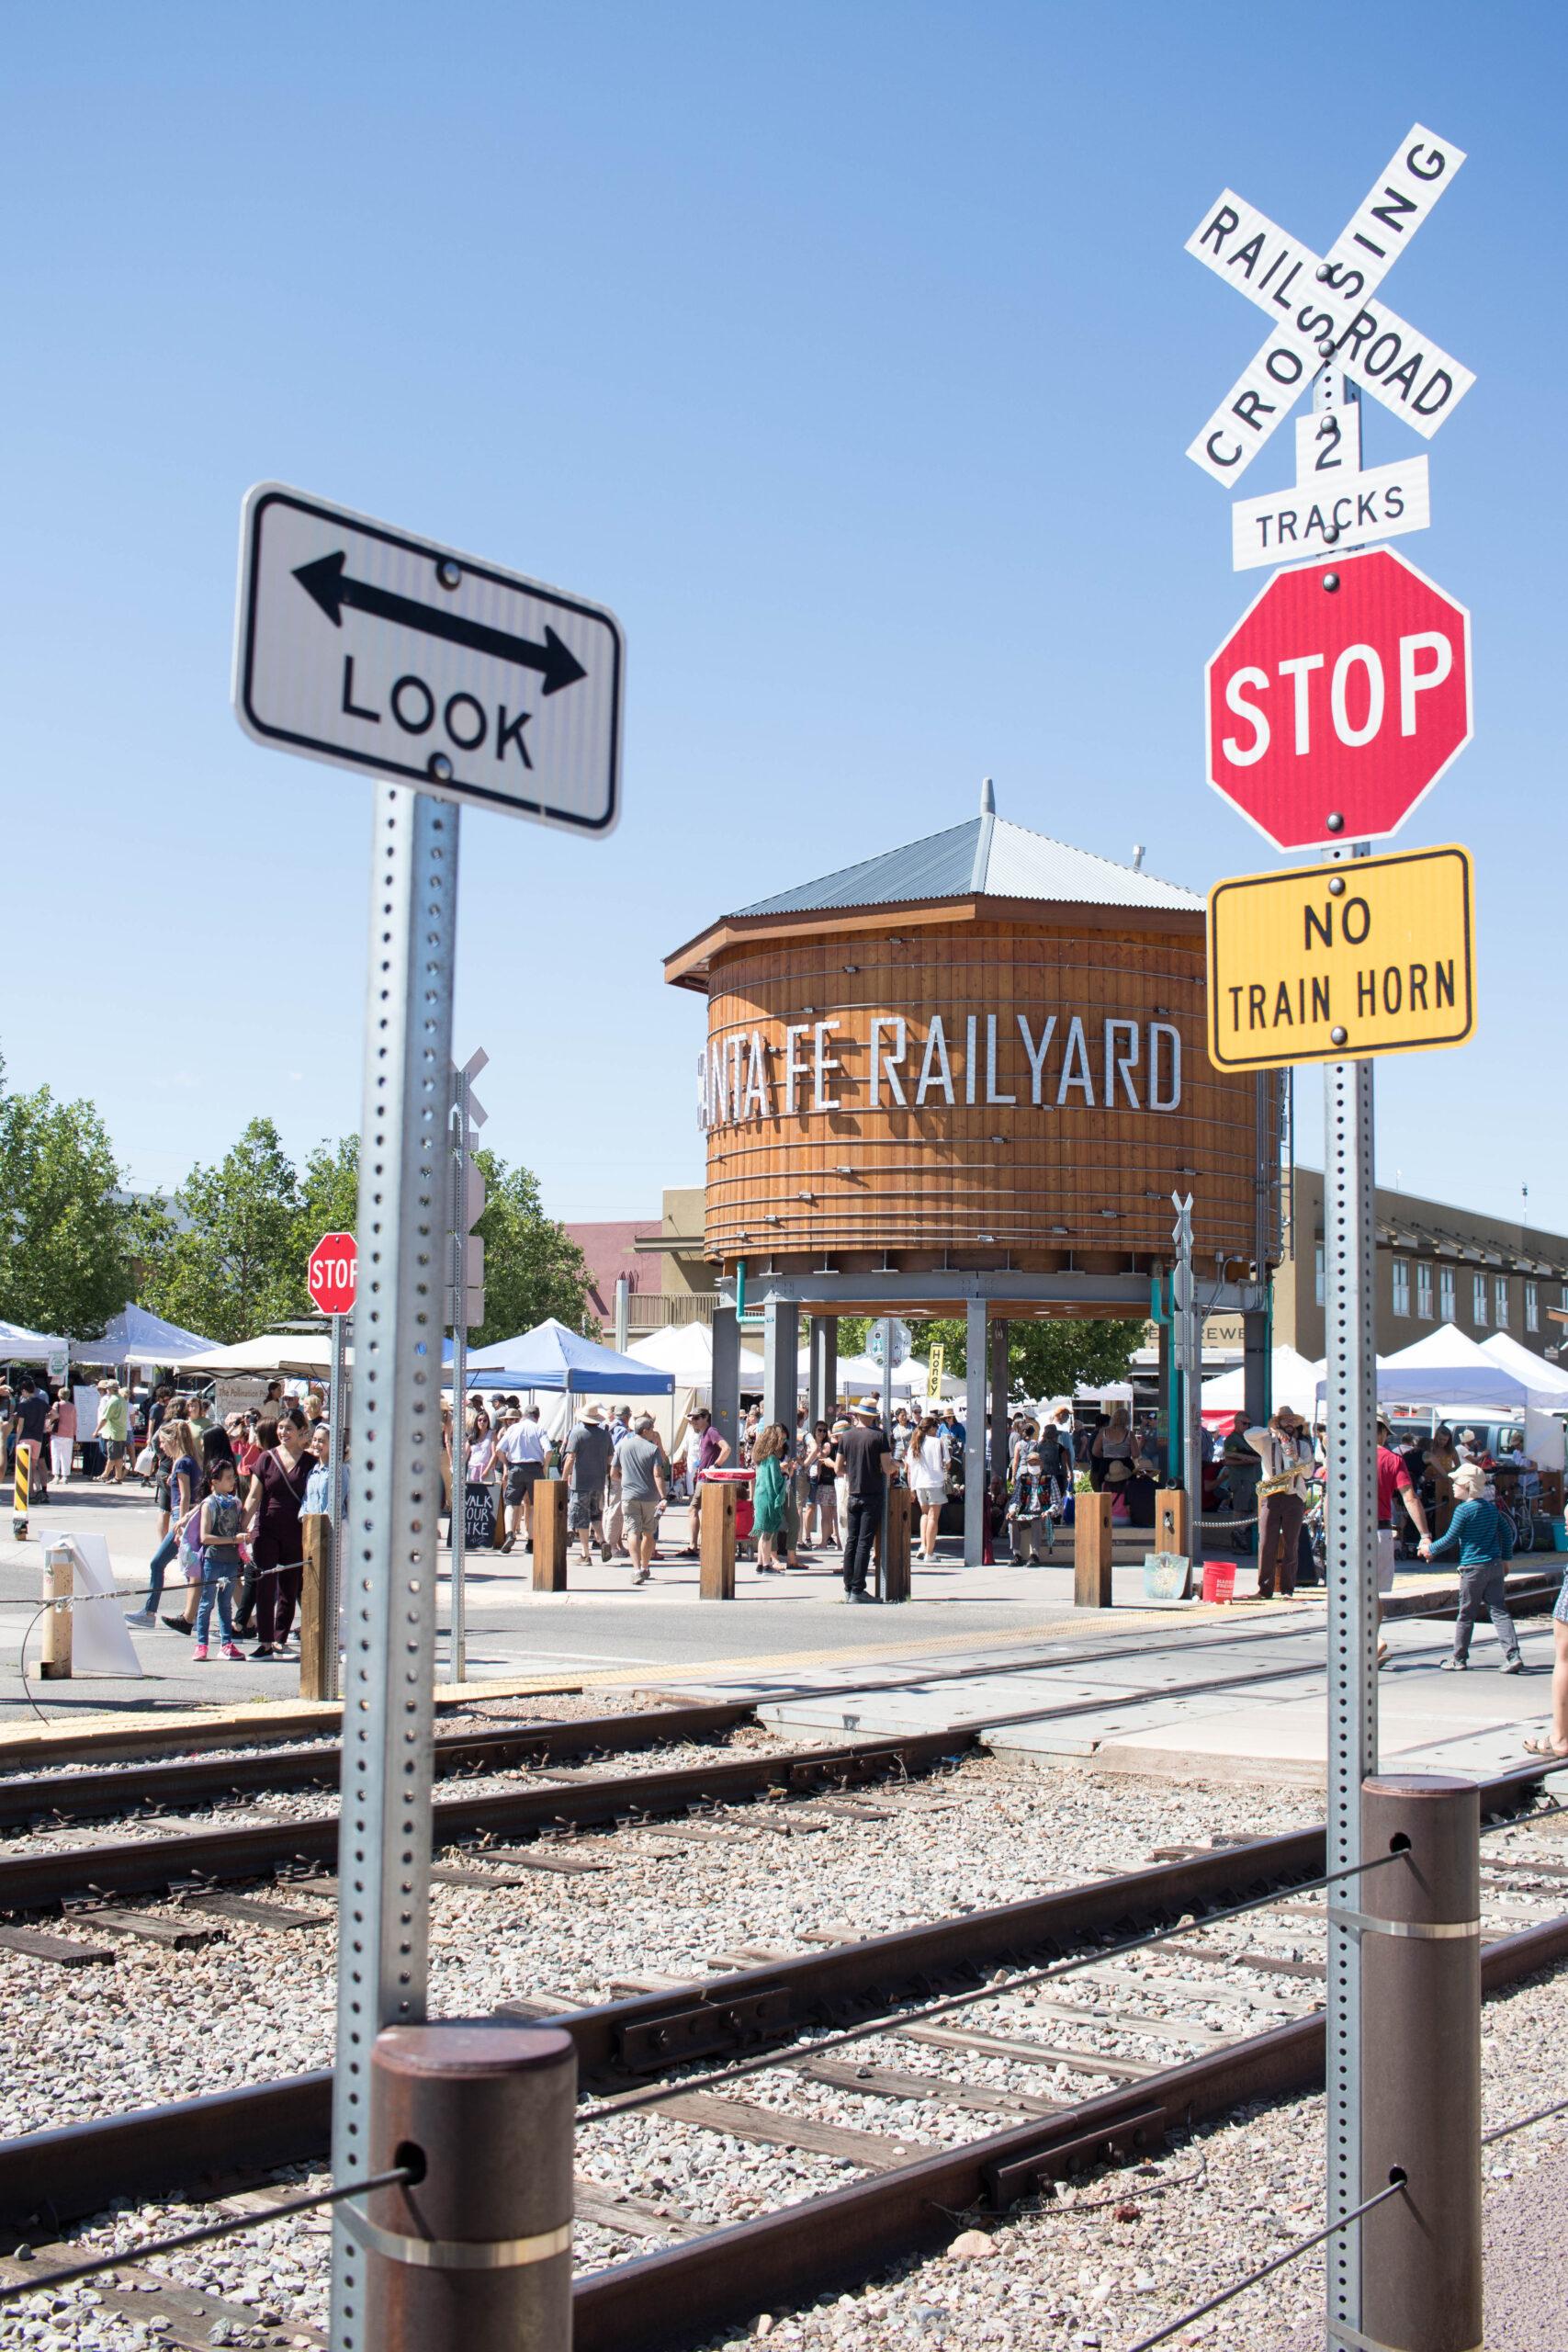 santa fe railyards farmers market #farmersmarket #railyards #santafe